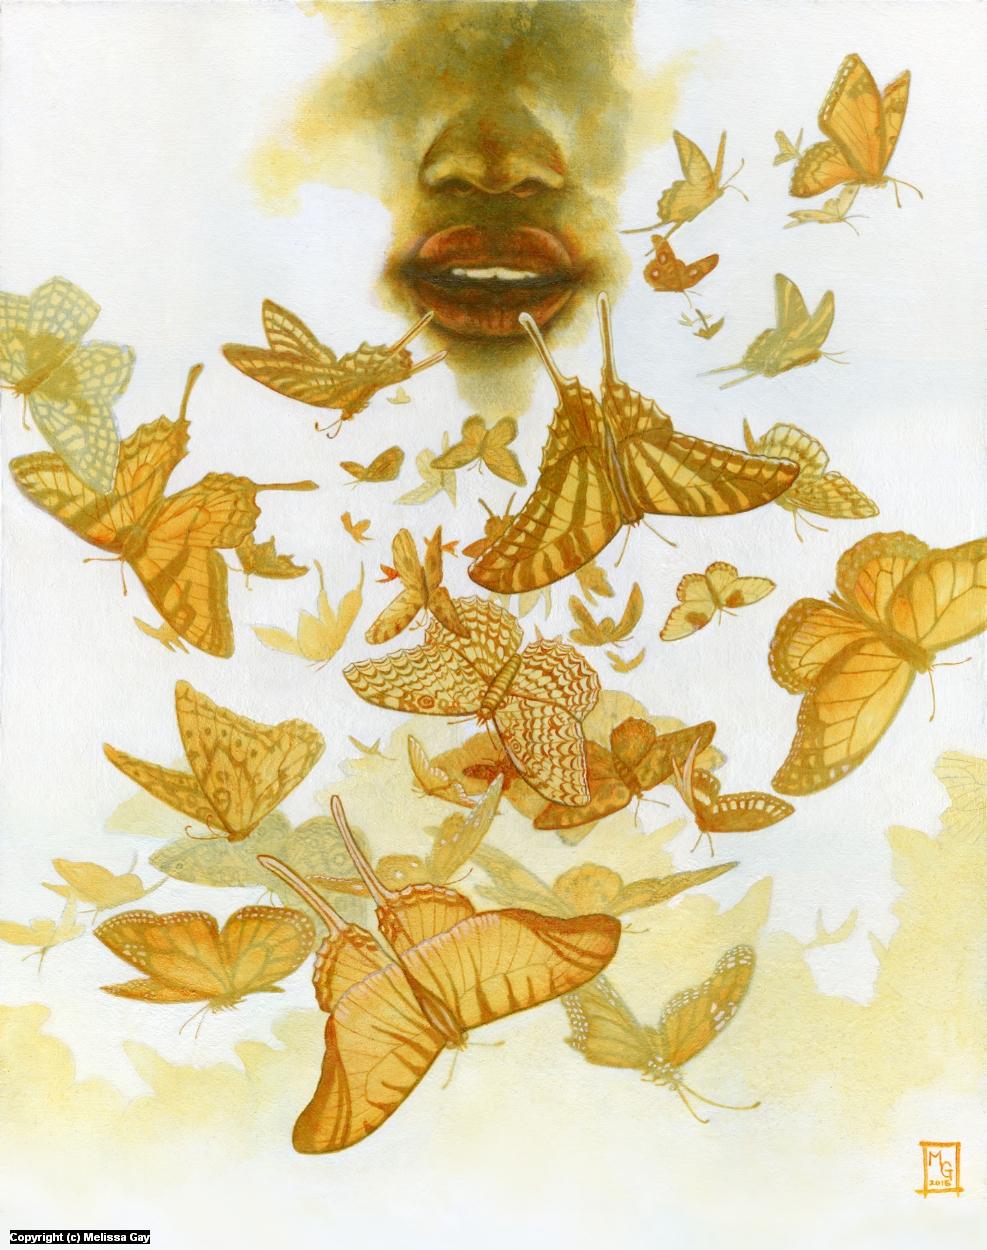 Breath of Life Artwork by Melissa Gay